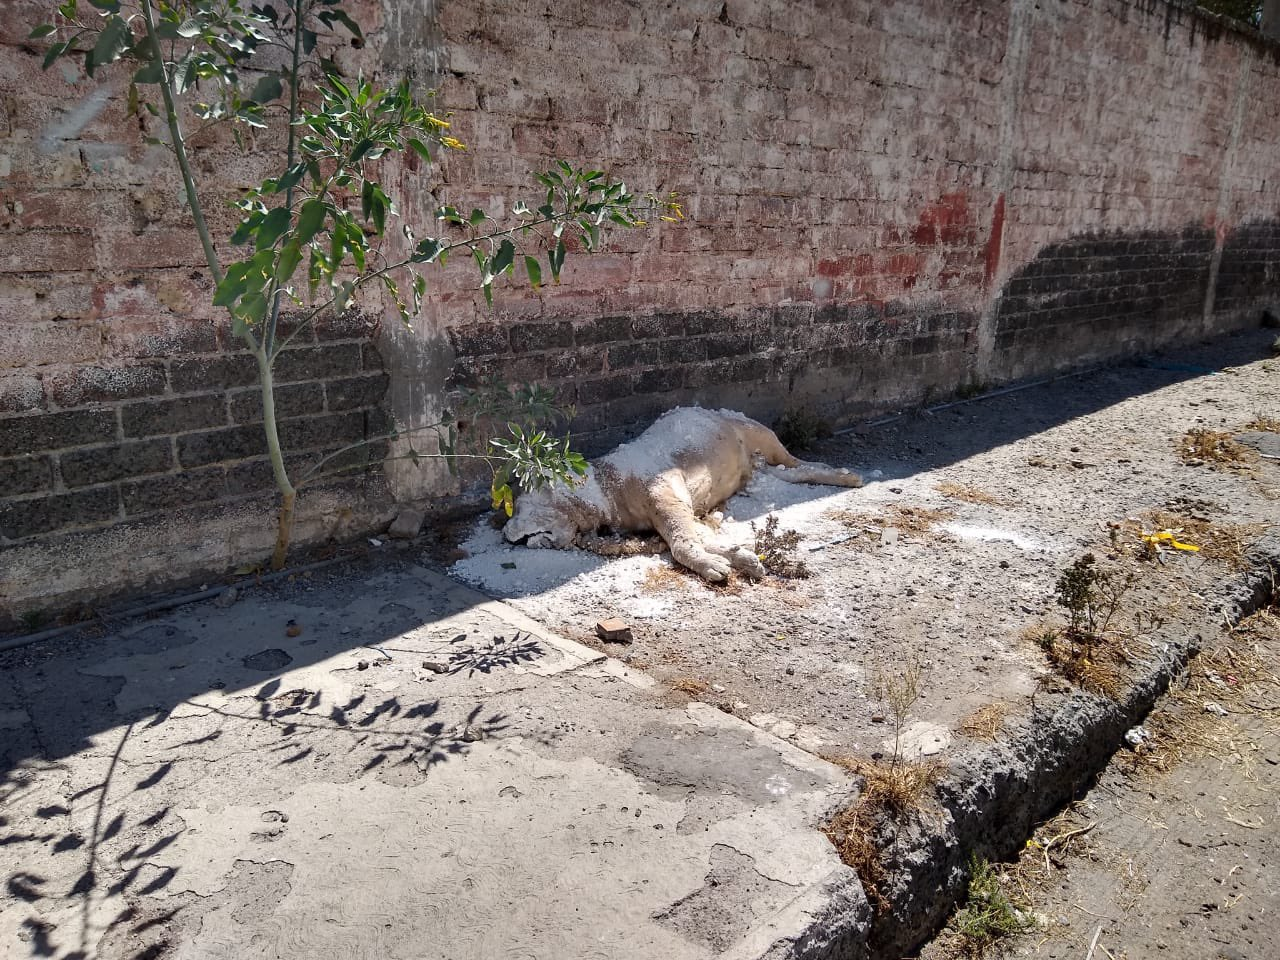 Hallan cadáver de un león en la alcaldía Iztapalapa